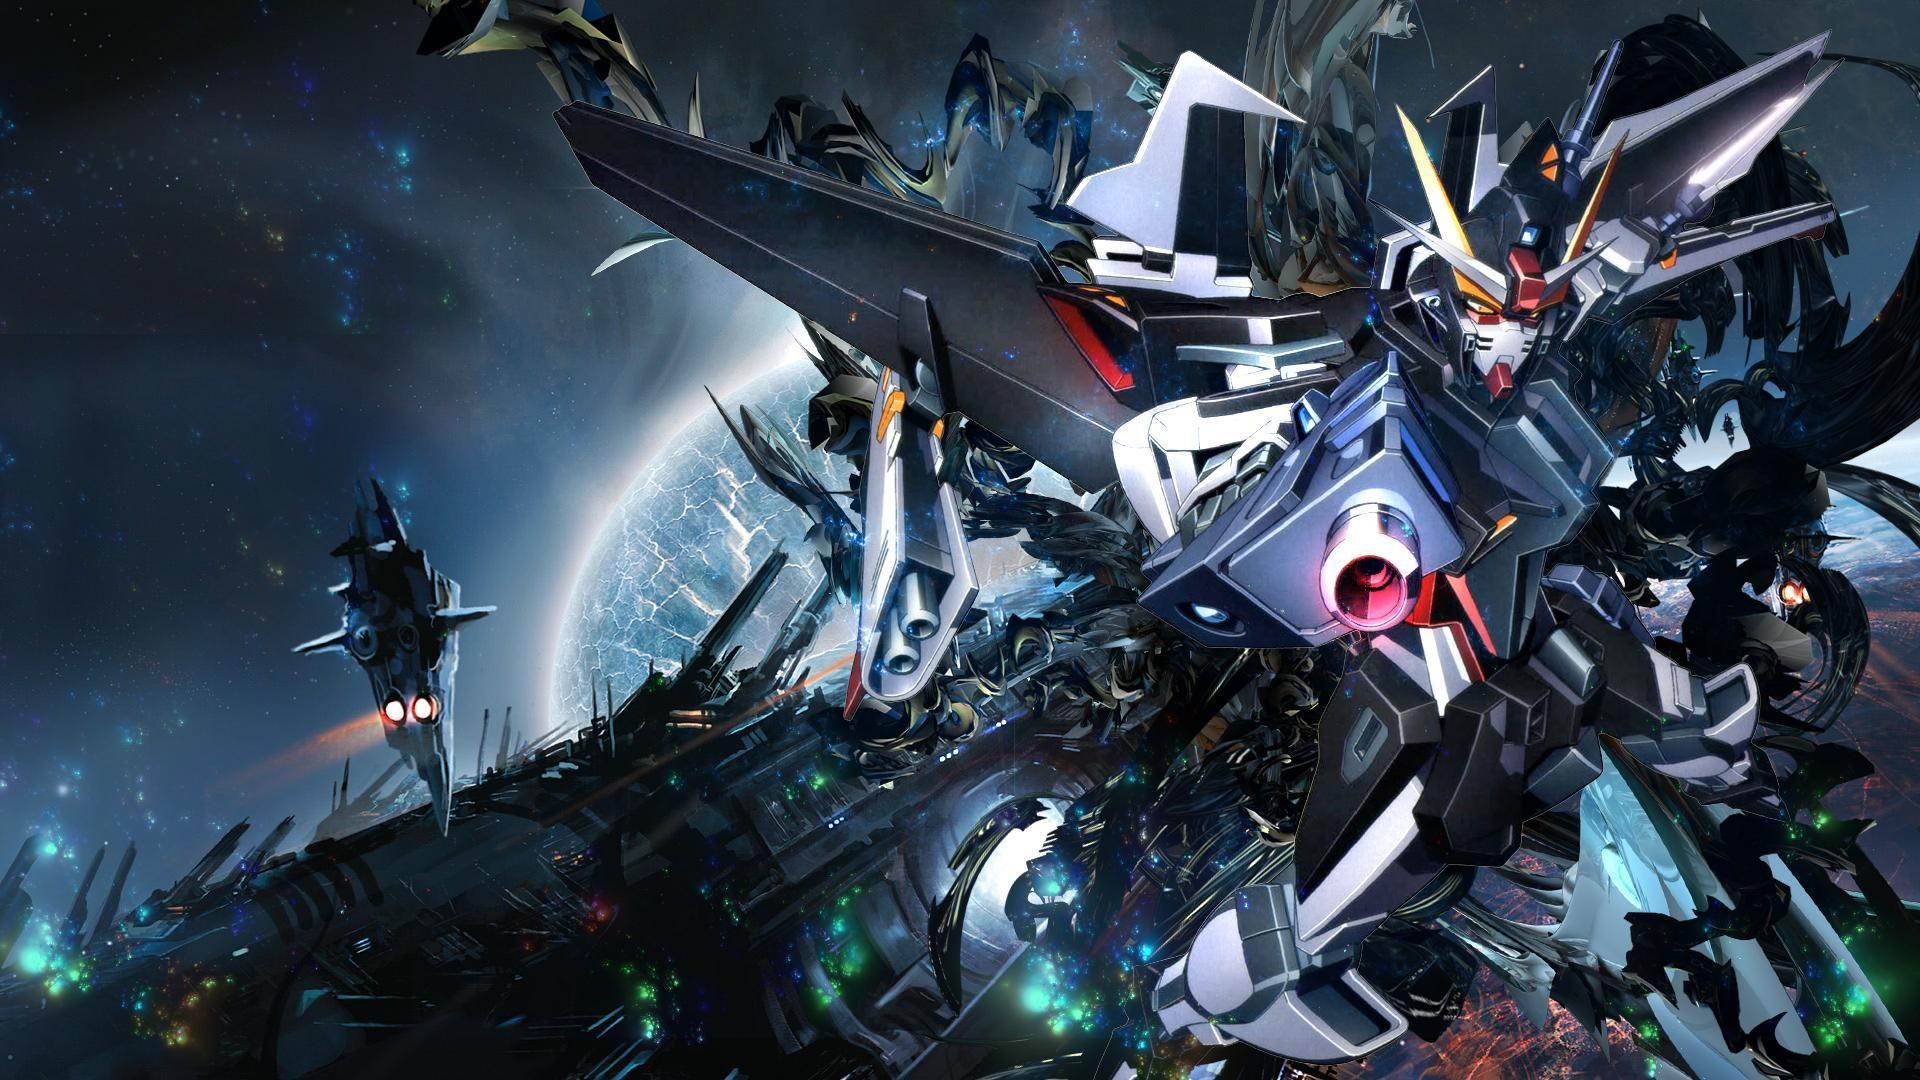 Download Gundam Wallpaper 3 APK 1.2 Only in DownloadAtoZ